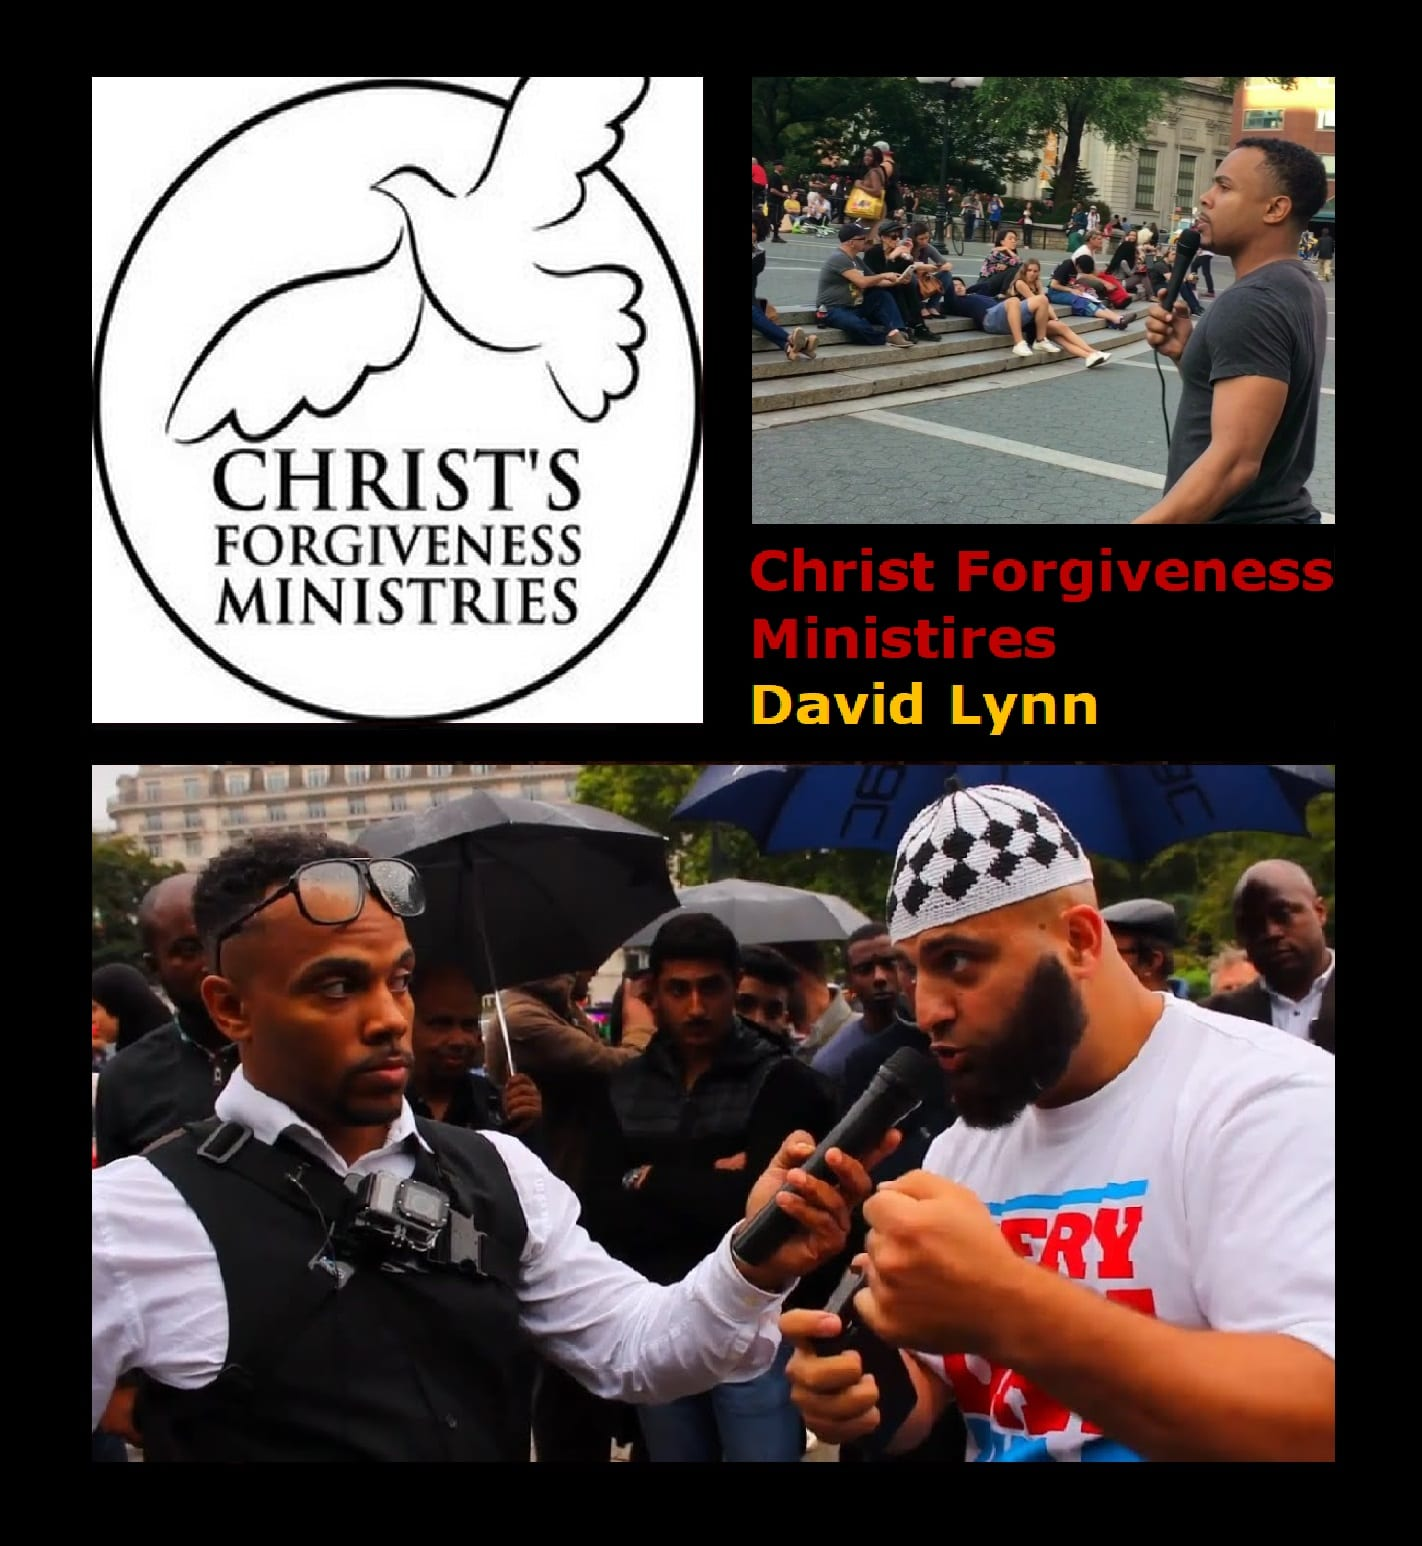 Christ forgiveness ministries